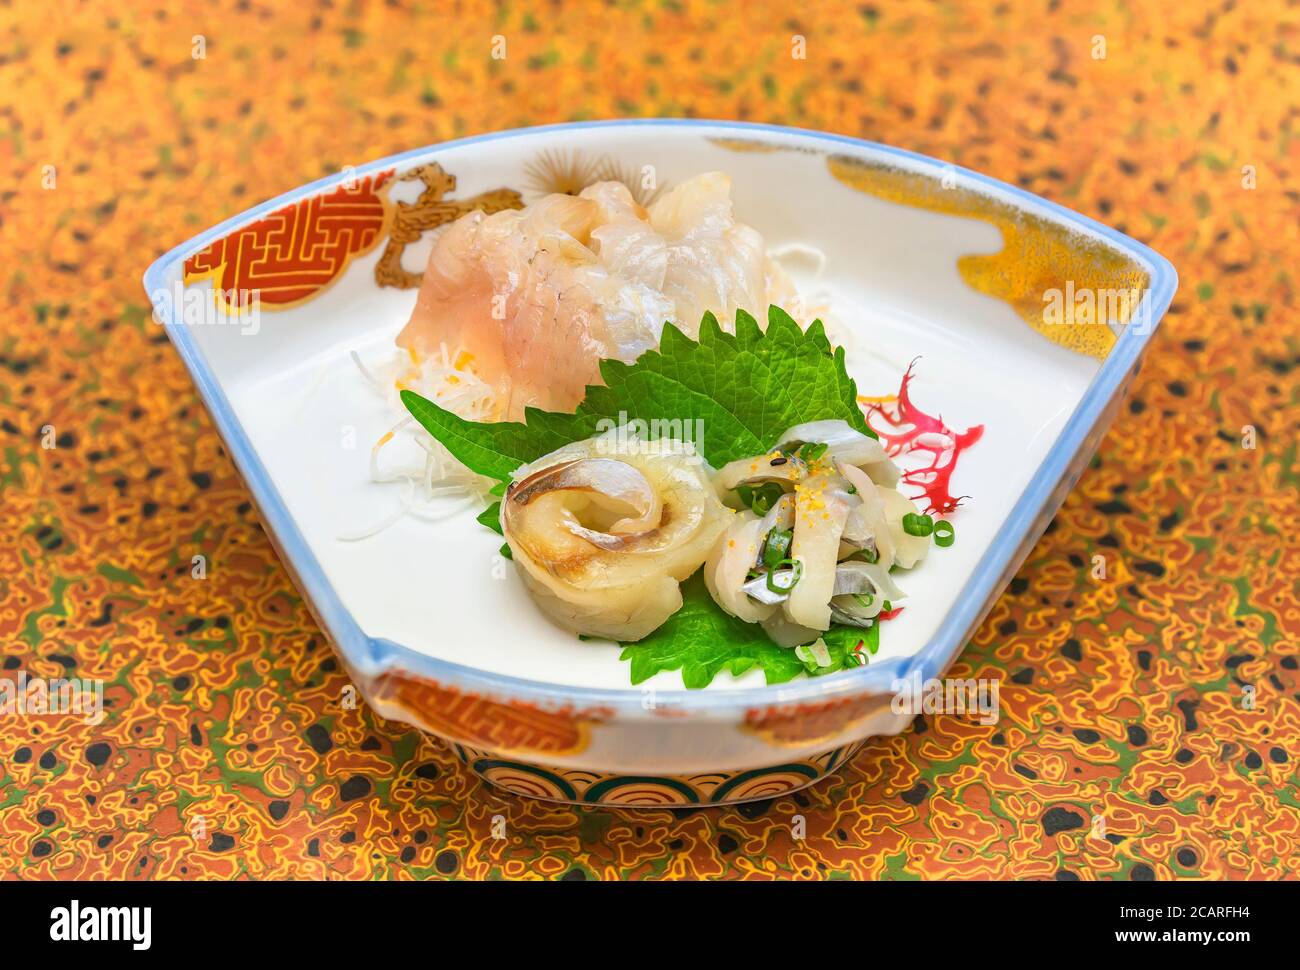 Raw sashimi high-class japanese cuisine of fresh Sayori needlefish, Madai seabream and Hirame halibut in a dish plate with Gracilaria red algae Stock Photo